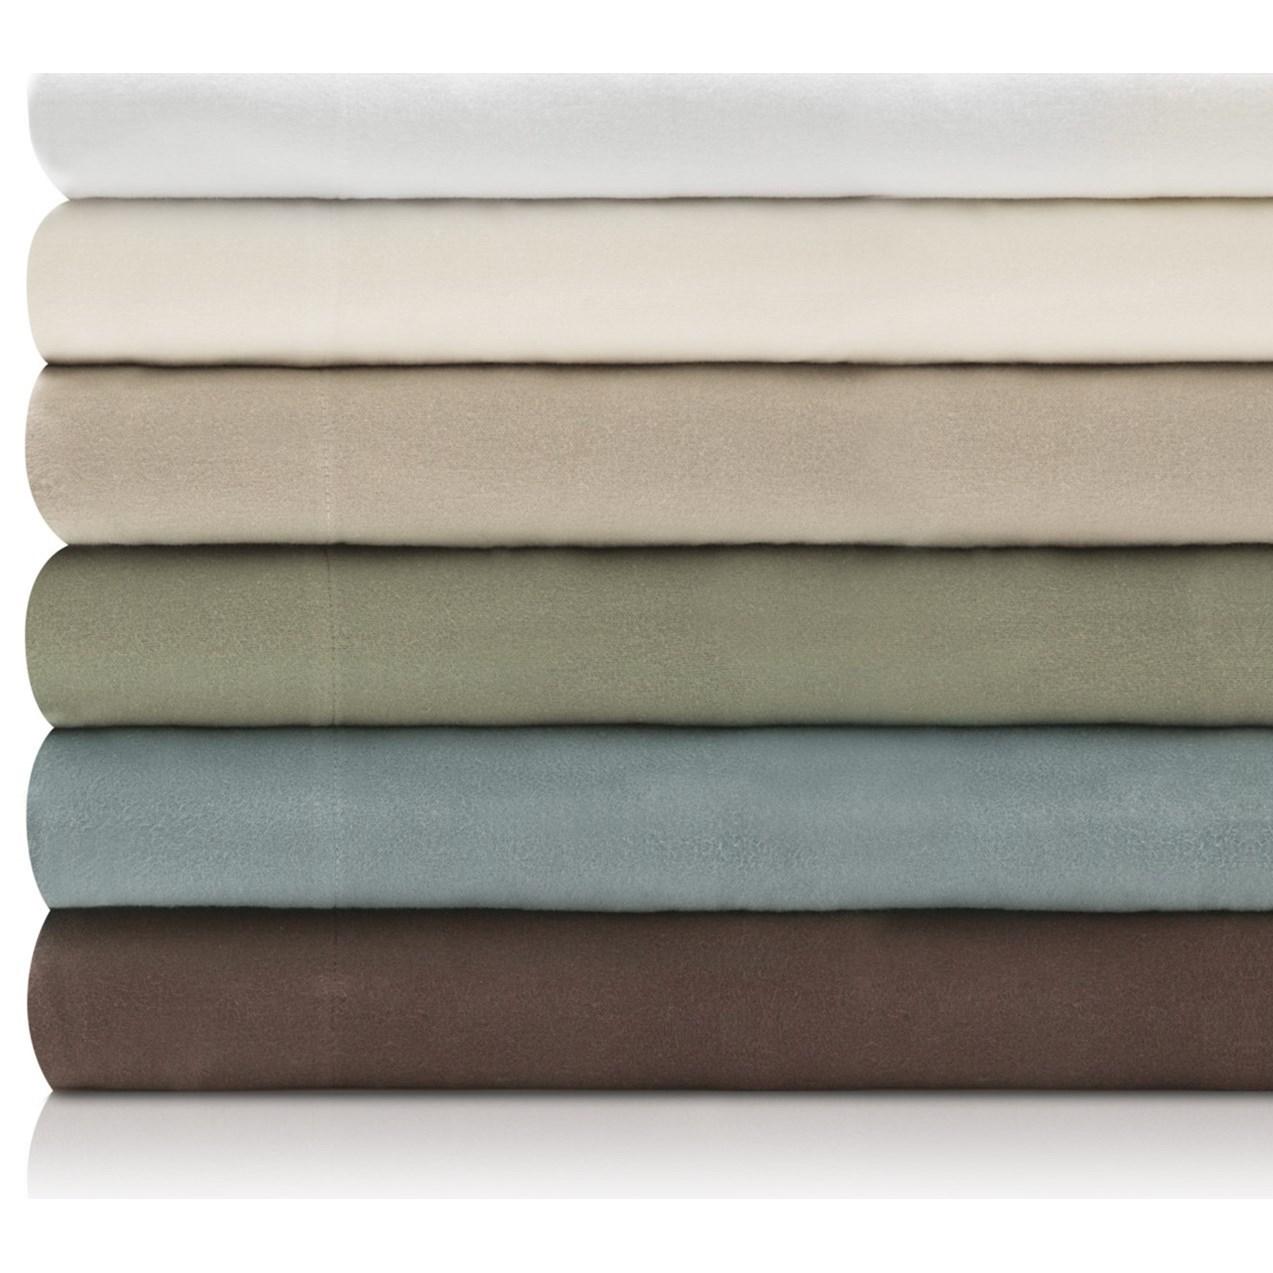 Malouf Portuguese Flannel Twin XL Woven™ Portuguese Flannel Sheet Set - Item Number: WO19TXPNFS